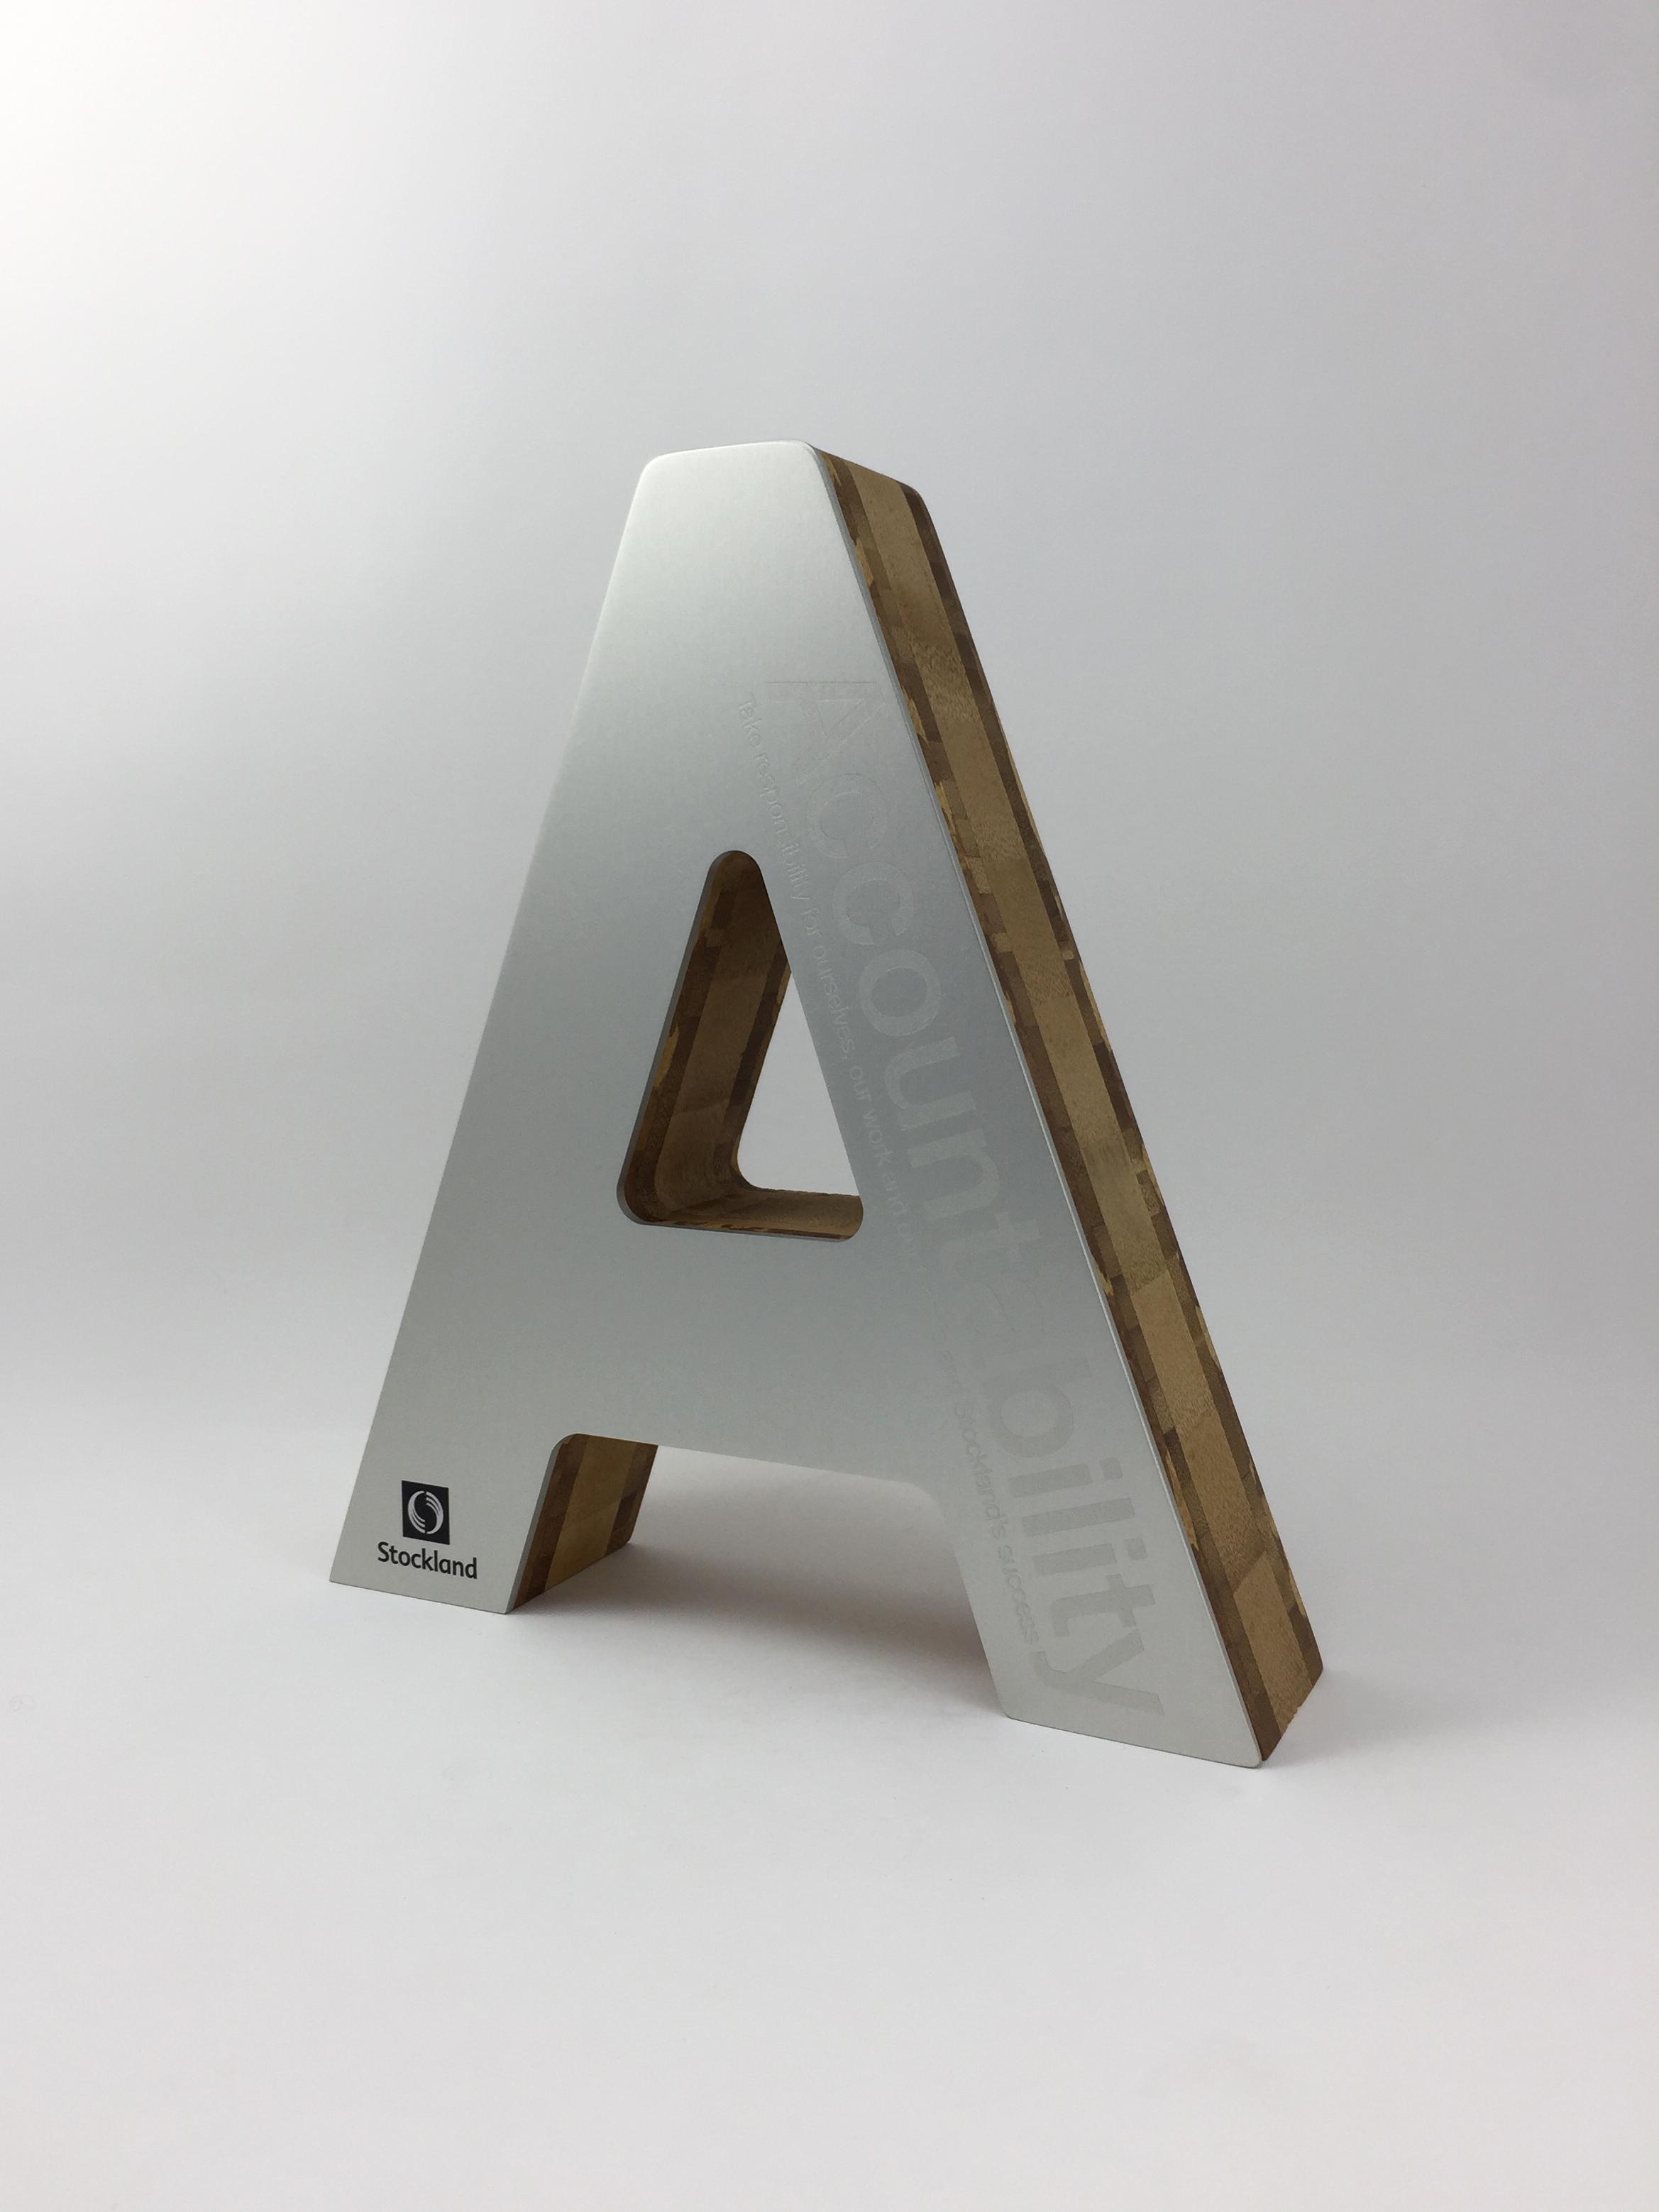 stockland-care-awards-eco-bamboo-plywood-timber-aluminium-trophy-03.jpg